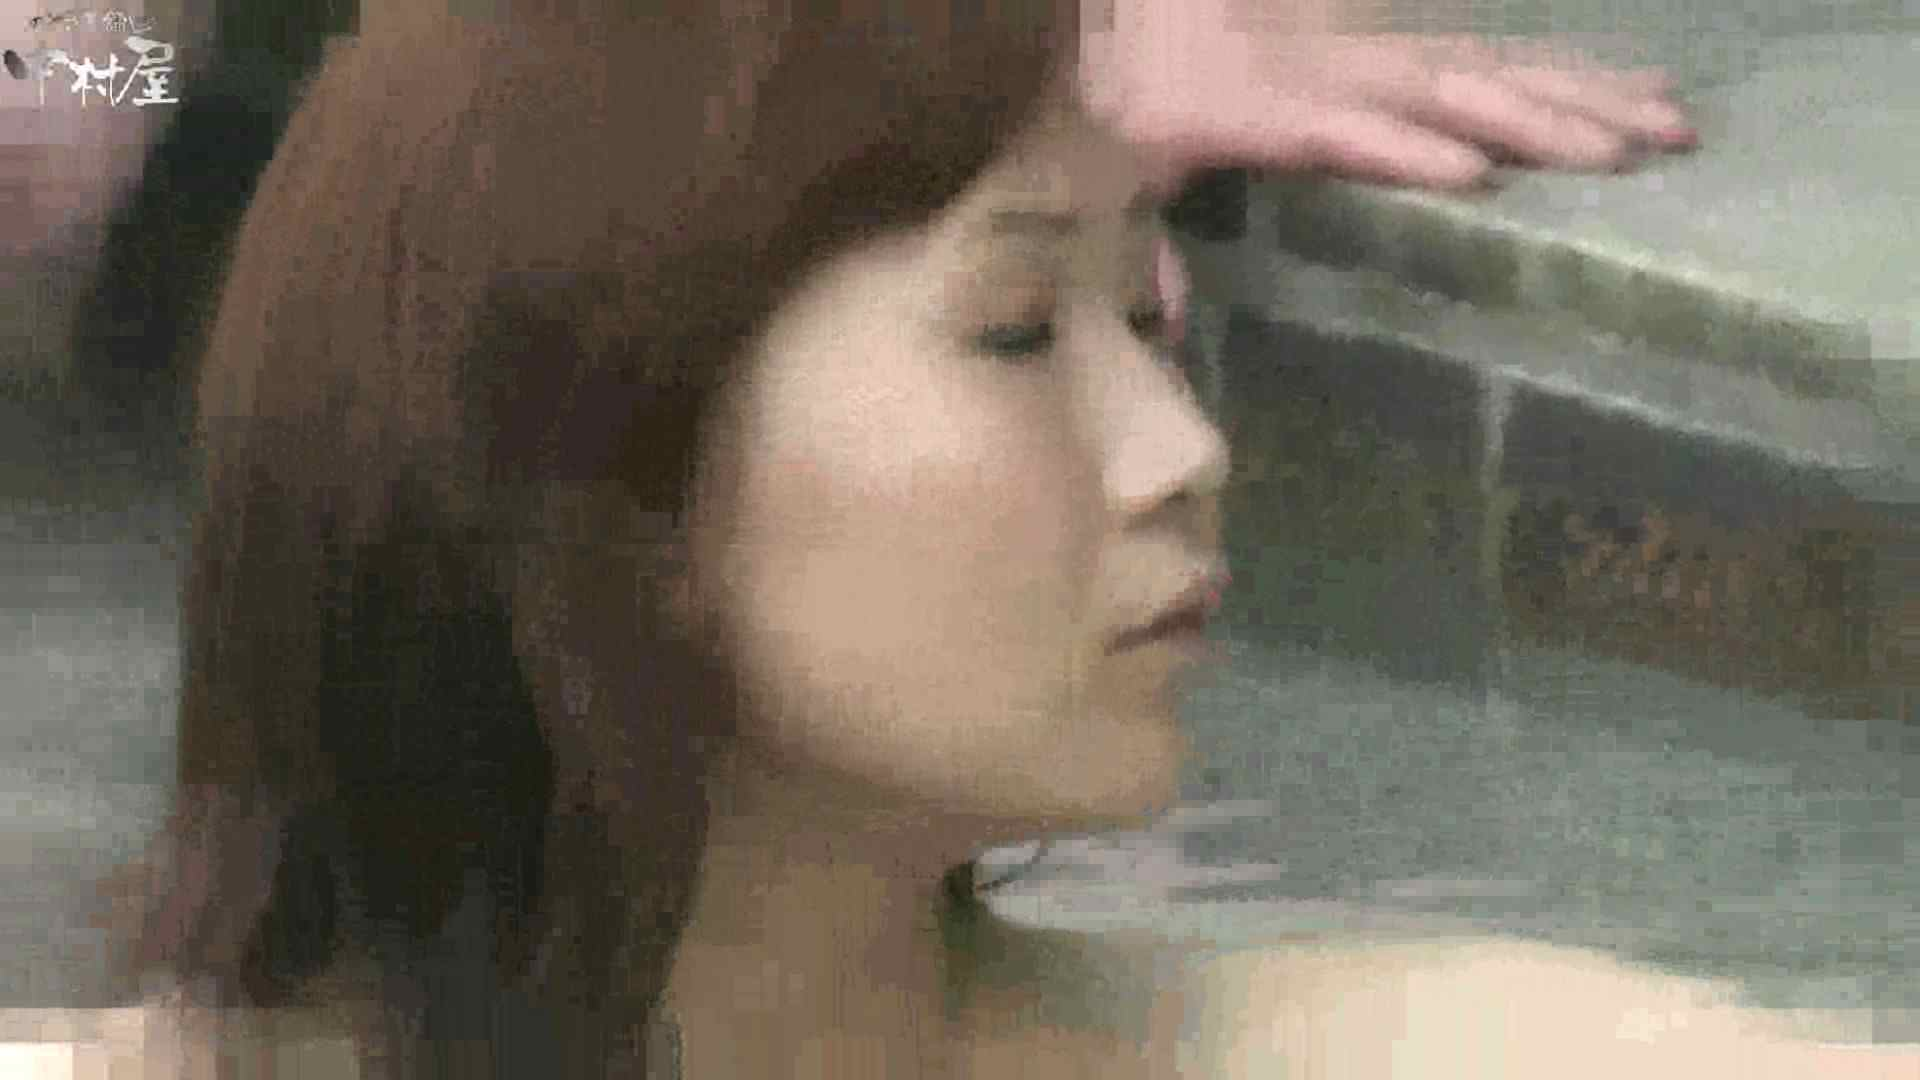 Aquaな露天風呂Vol.877潜入盗撮露天風呂十三判湯 其の二 潜入 | 盗撮シリーズ  100PIX 70